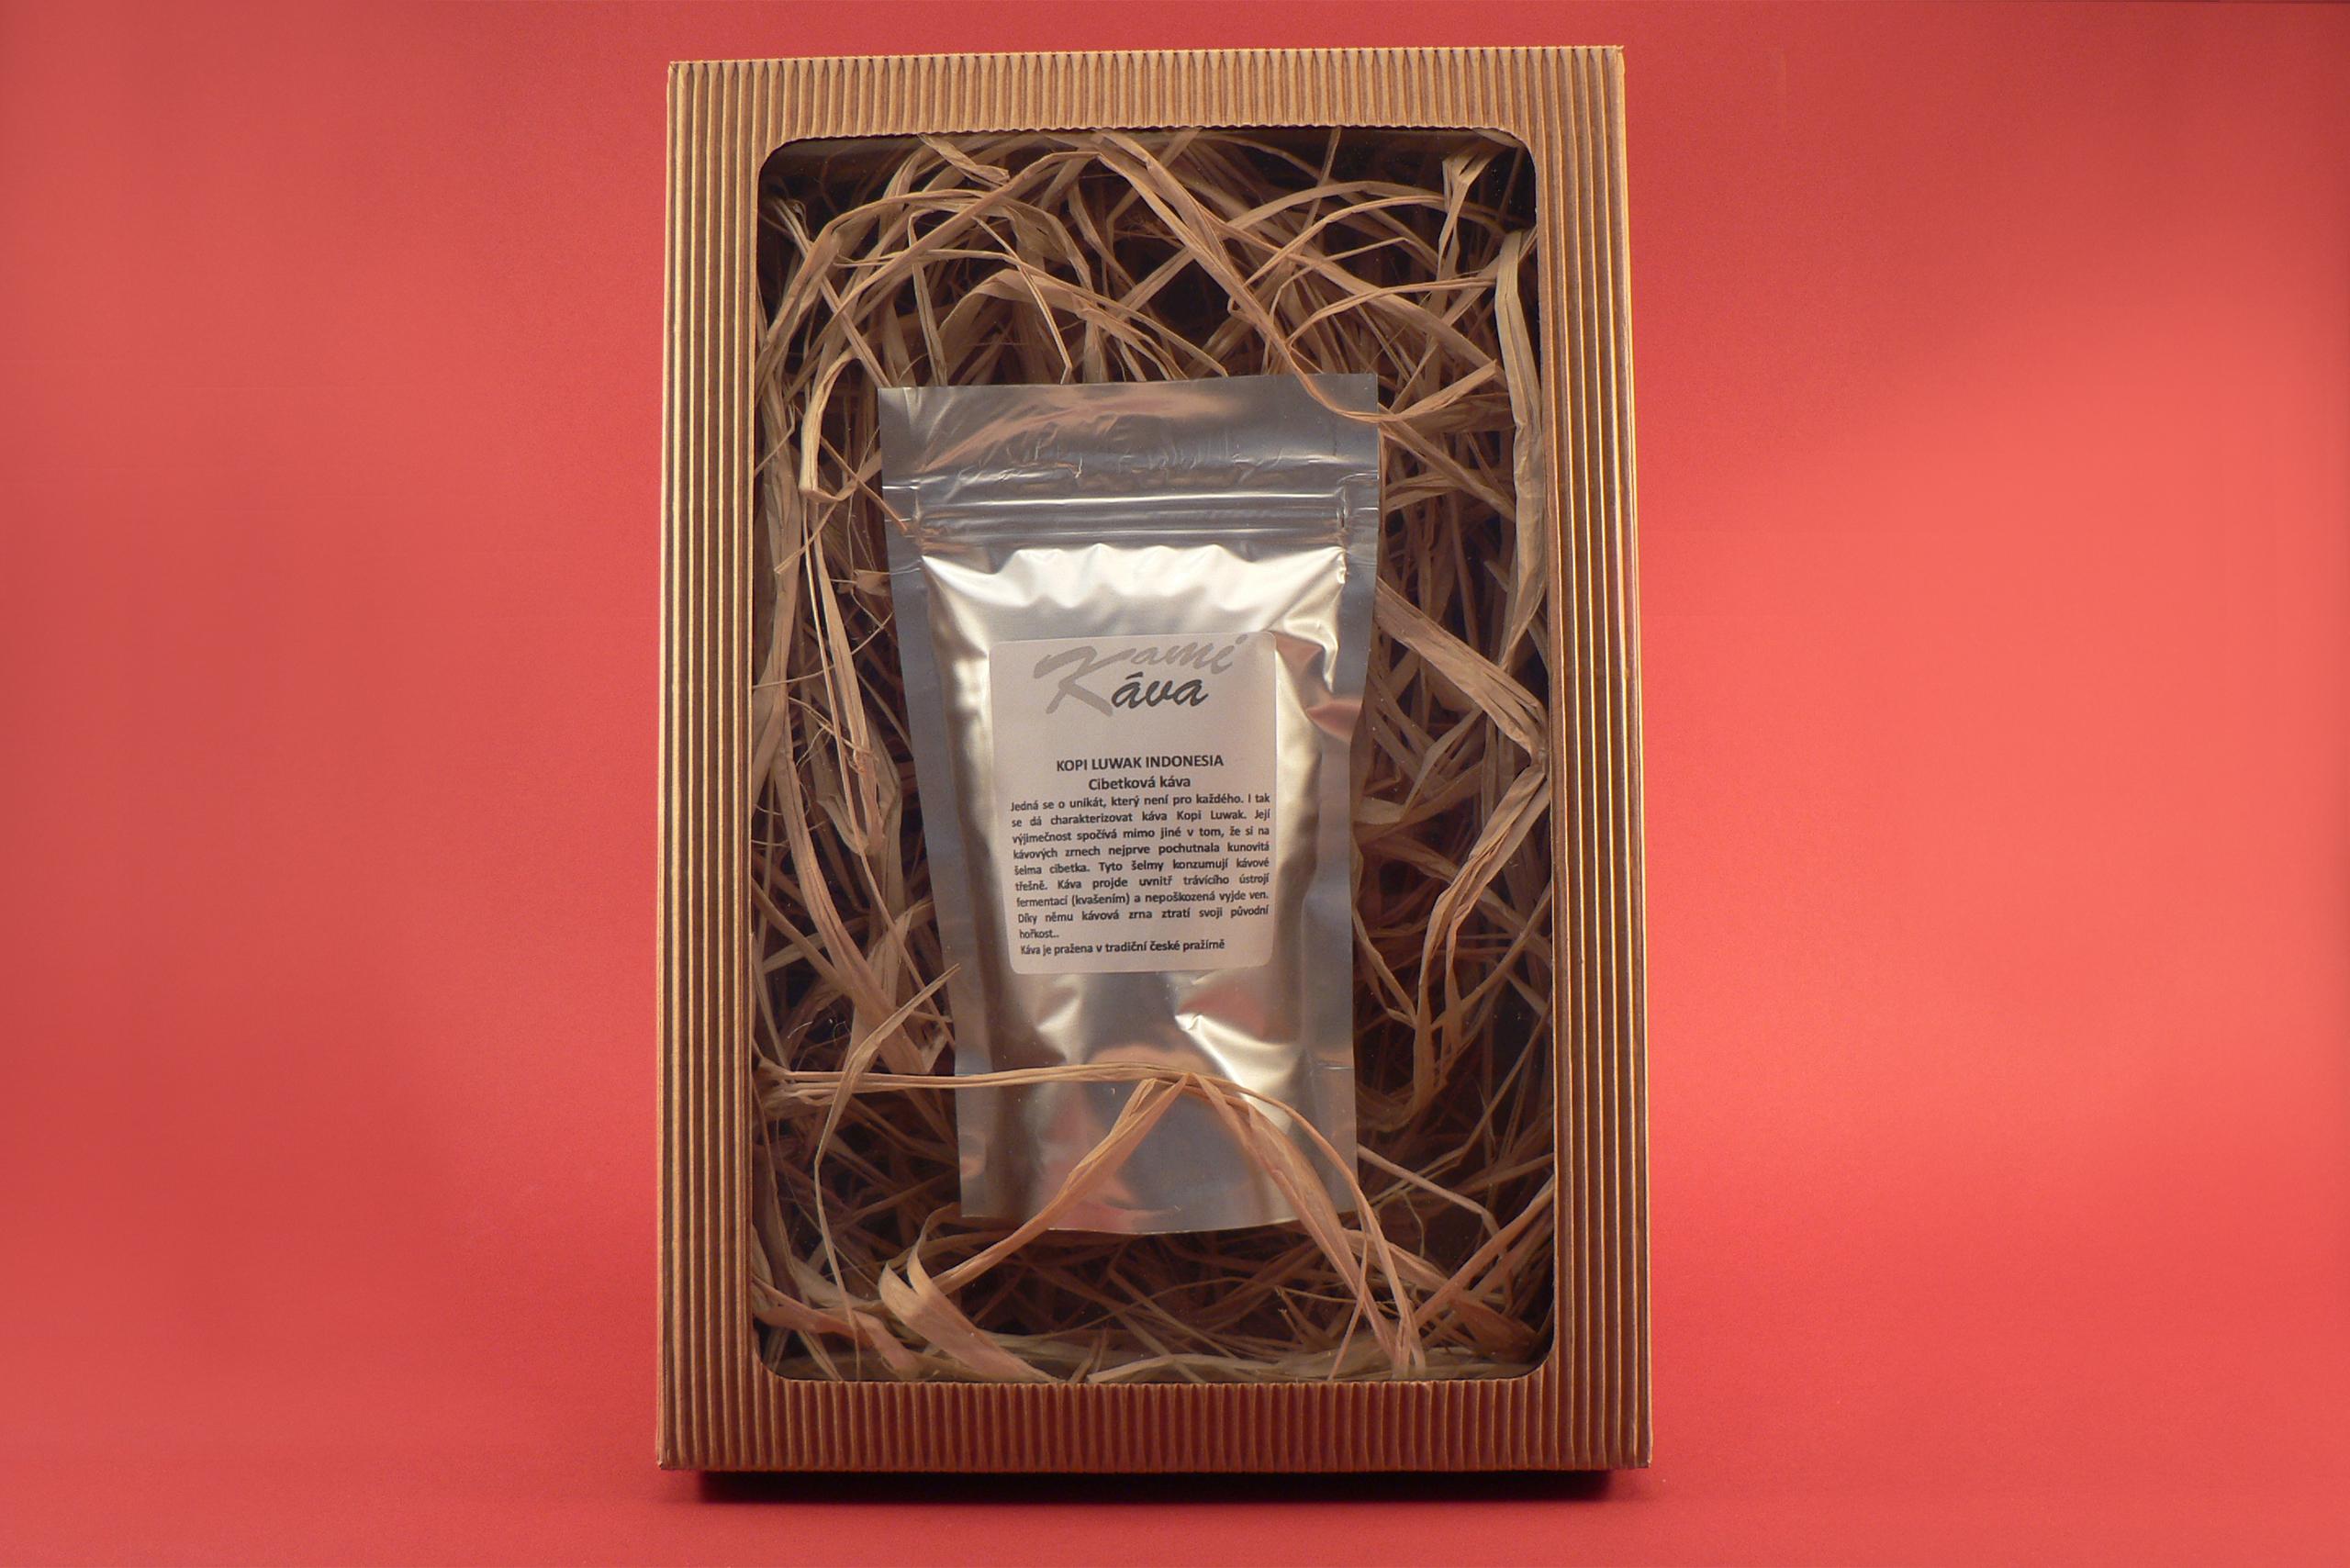 Kopi Luwak Indonesia - Cibetkova káva 100g (250g, 500g, 1000g) 100 g